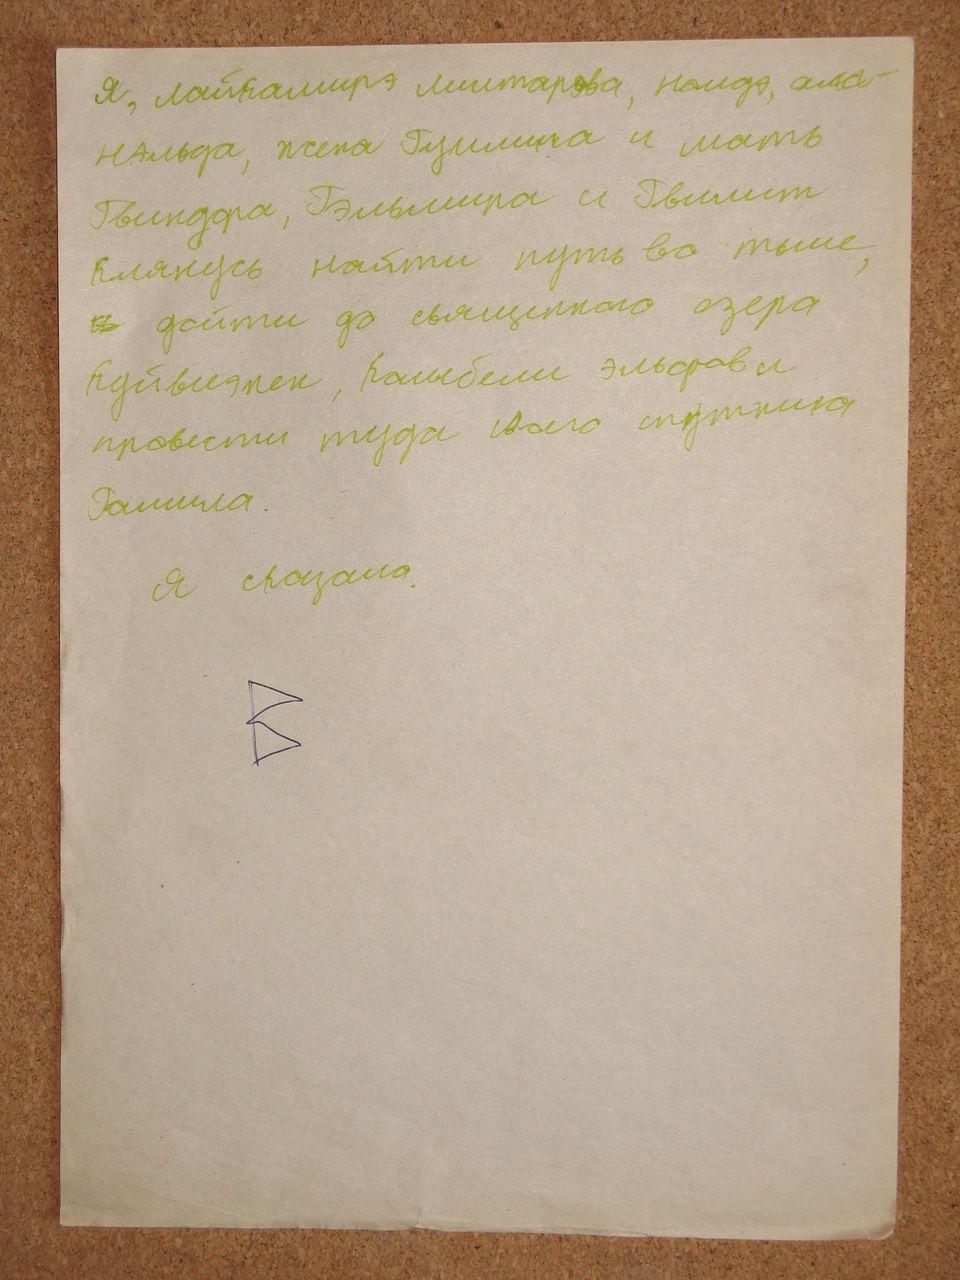 Vesdin — «IMG_9696.JPG» на Яндекс.Фотках